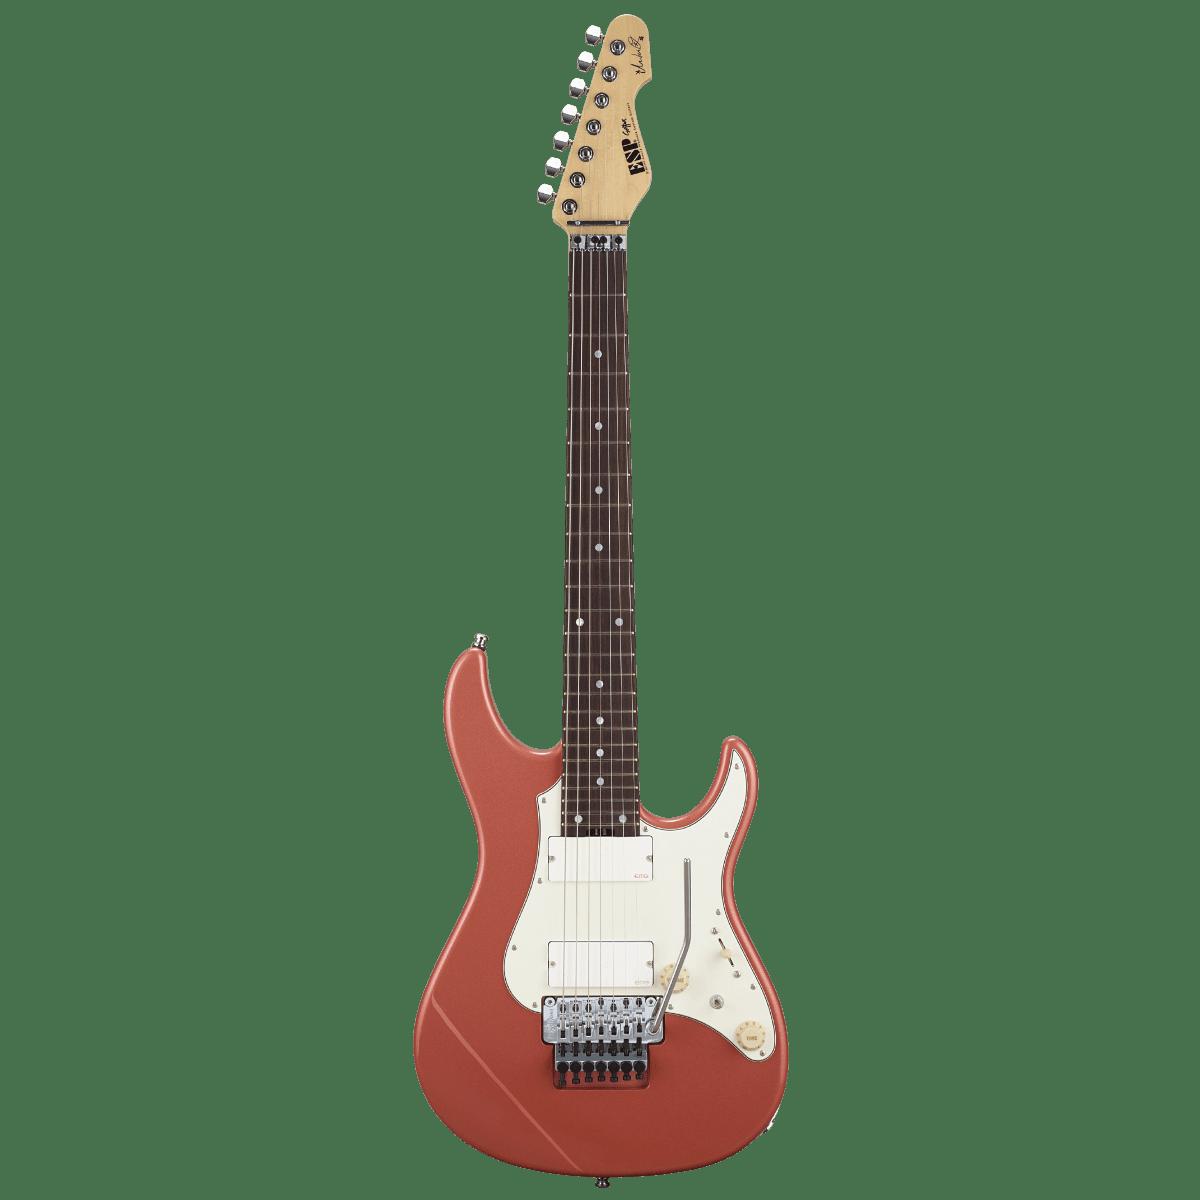 SNAPPER-7 Fujioka Custom